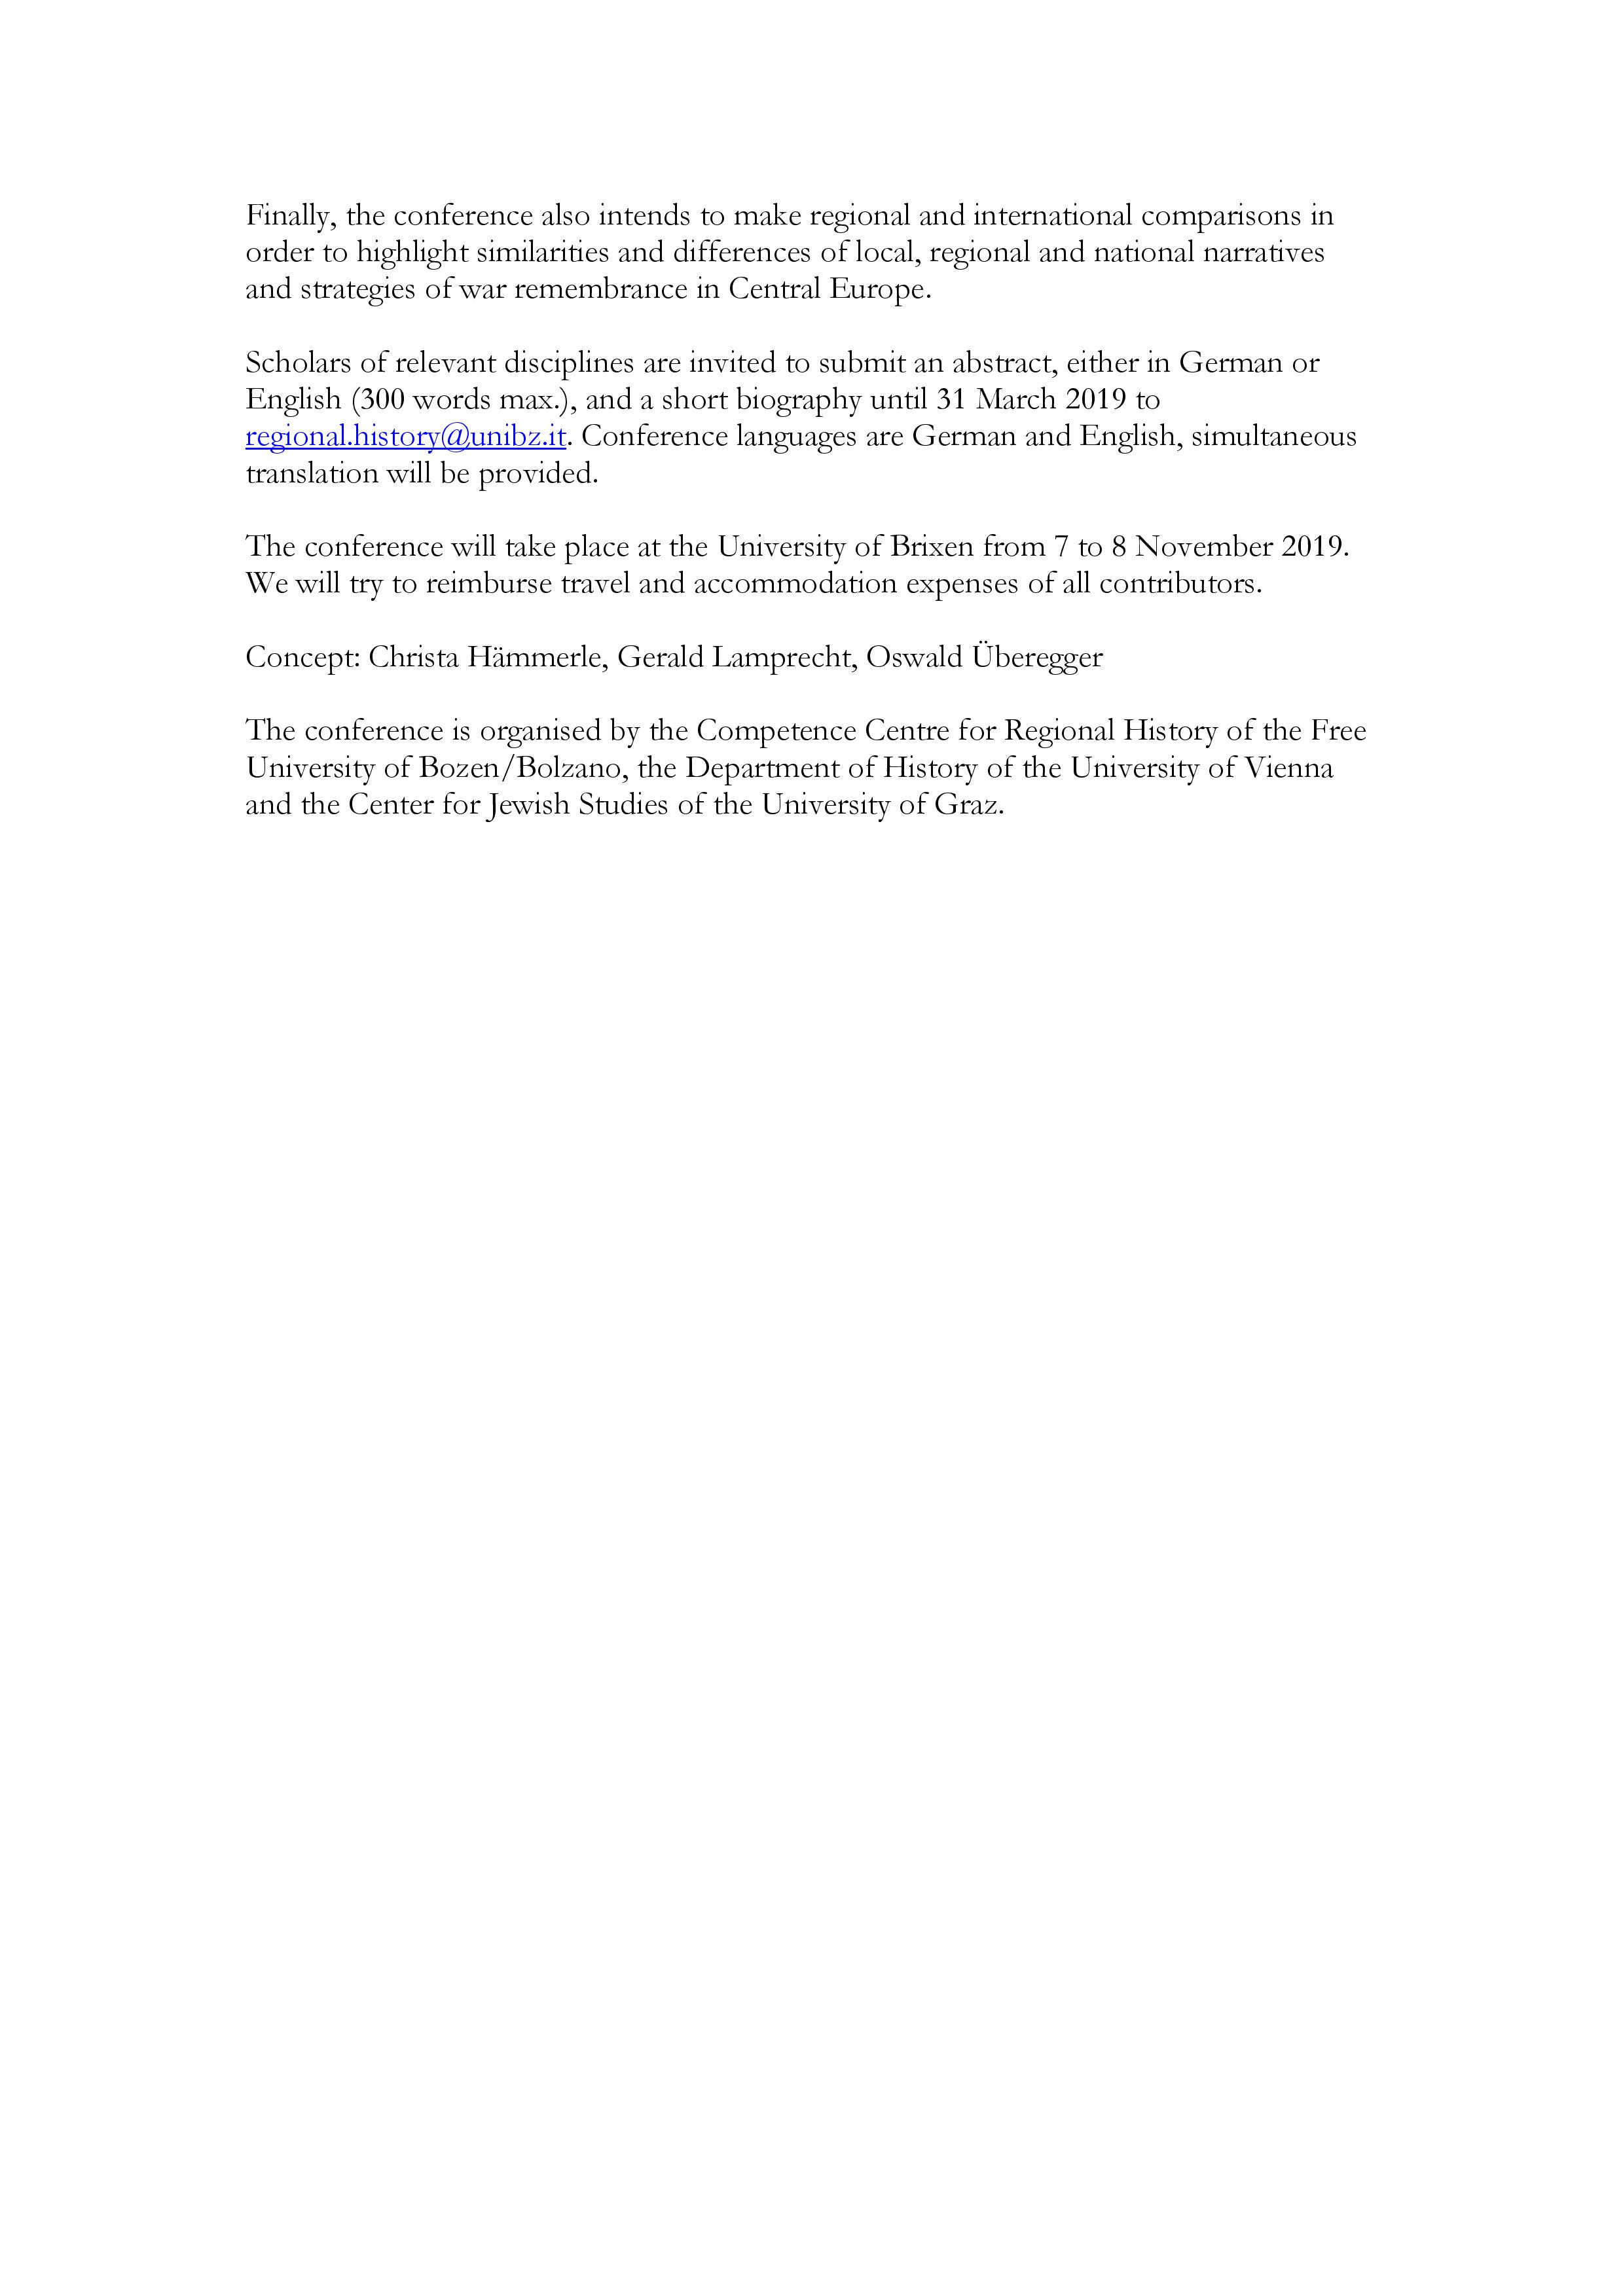 Call_KriegserinnerungEngl-final-page-002